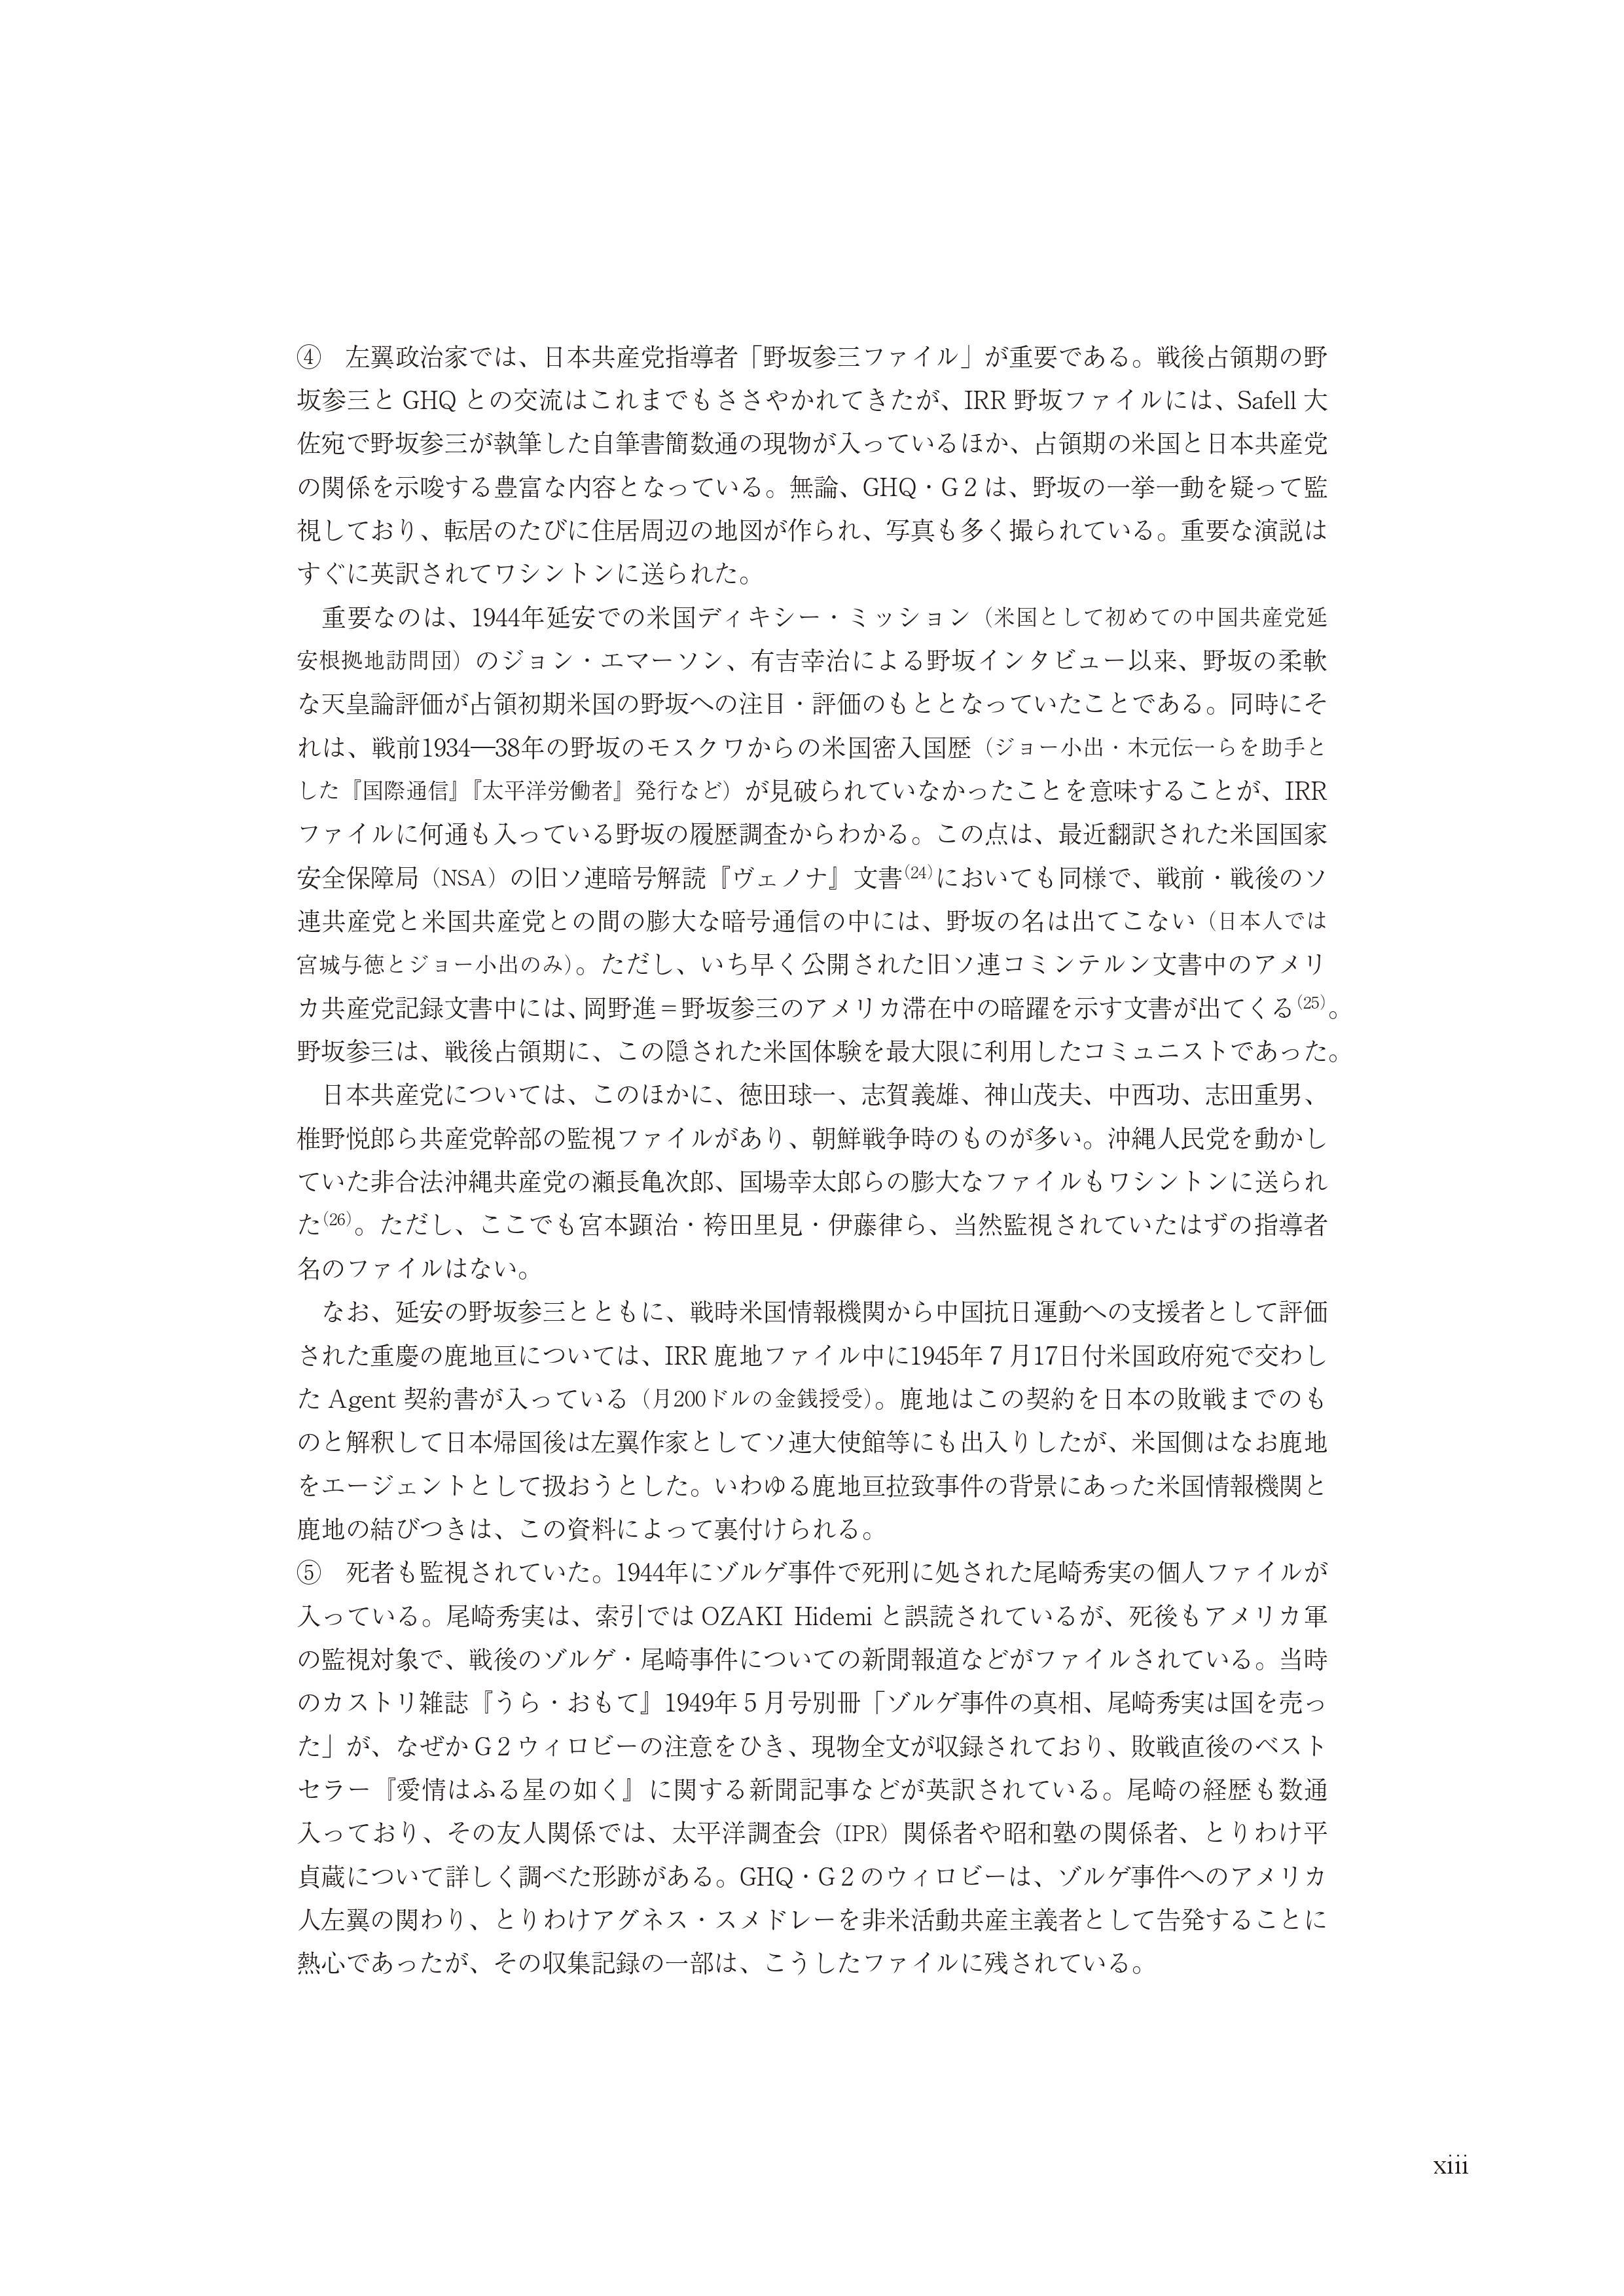 CIA日本人ファイル0001 (13)